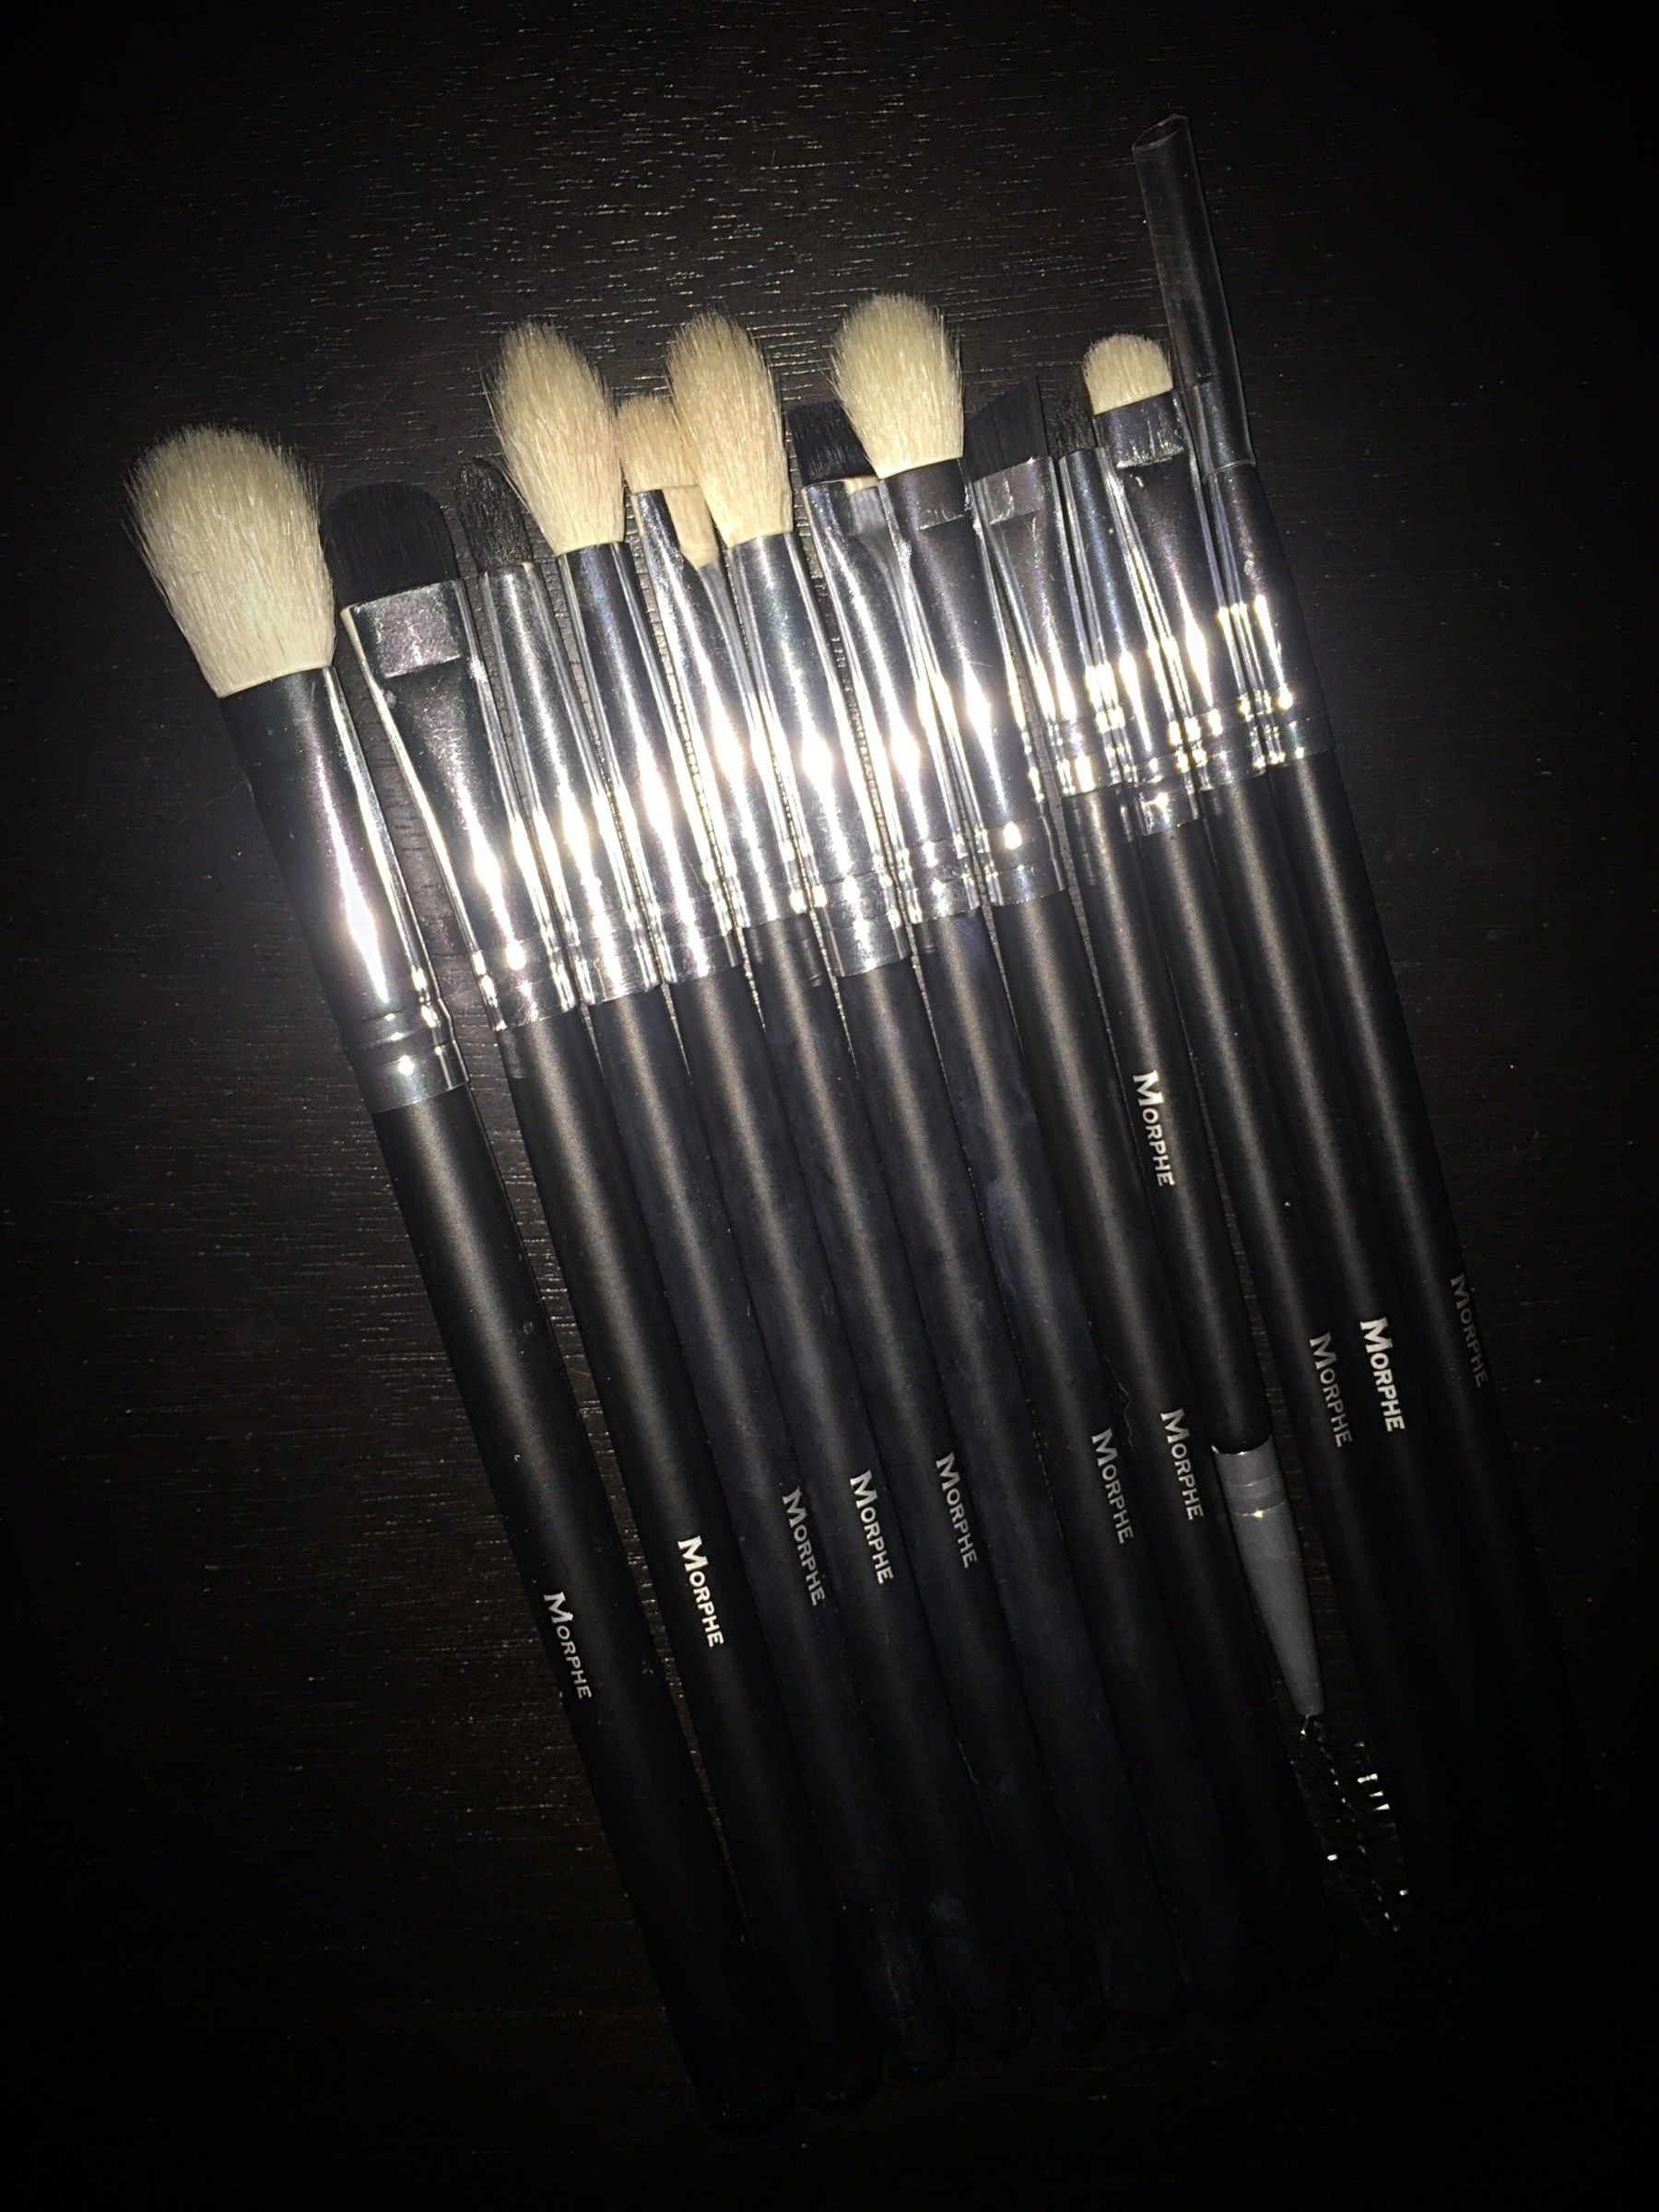 morphe eye brush set